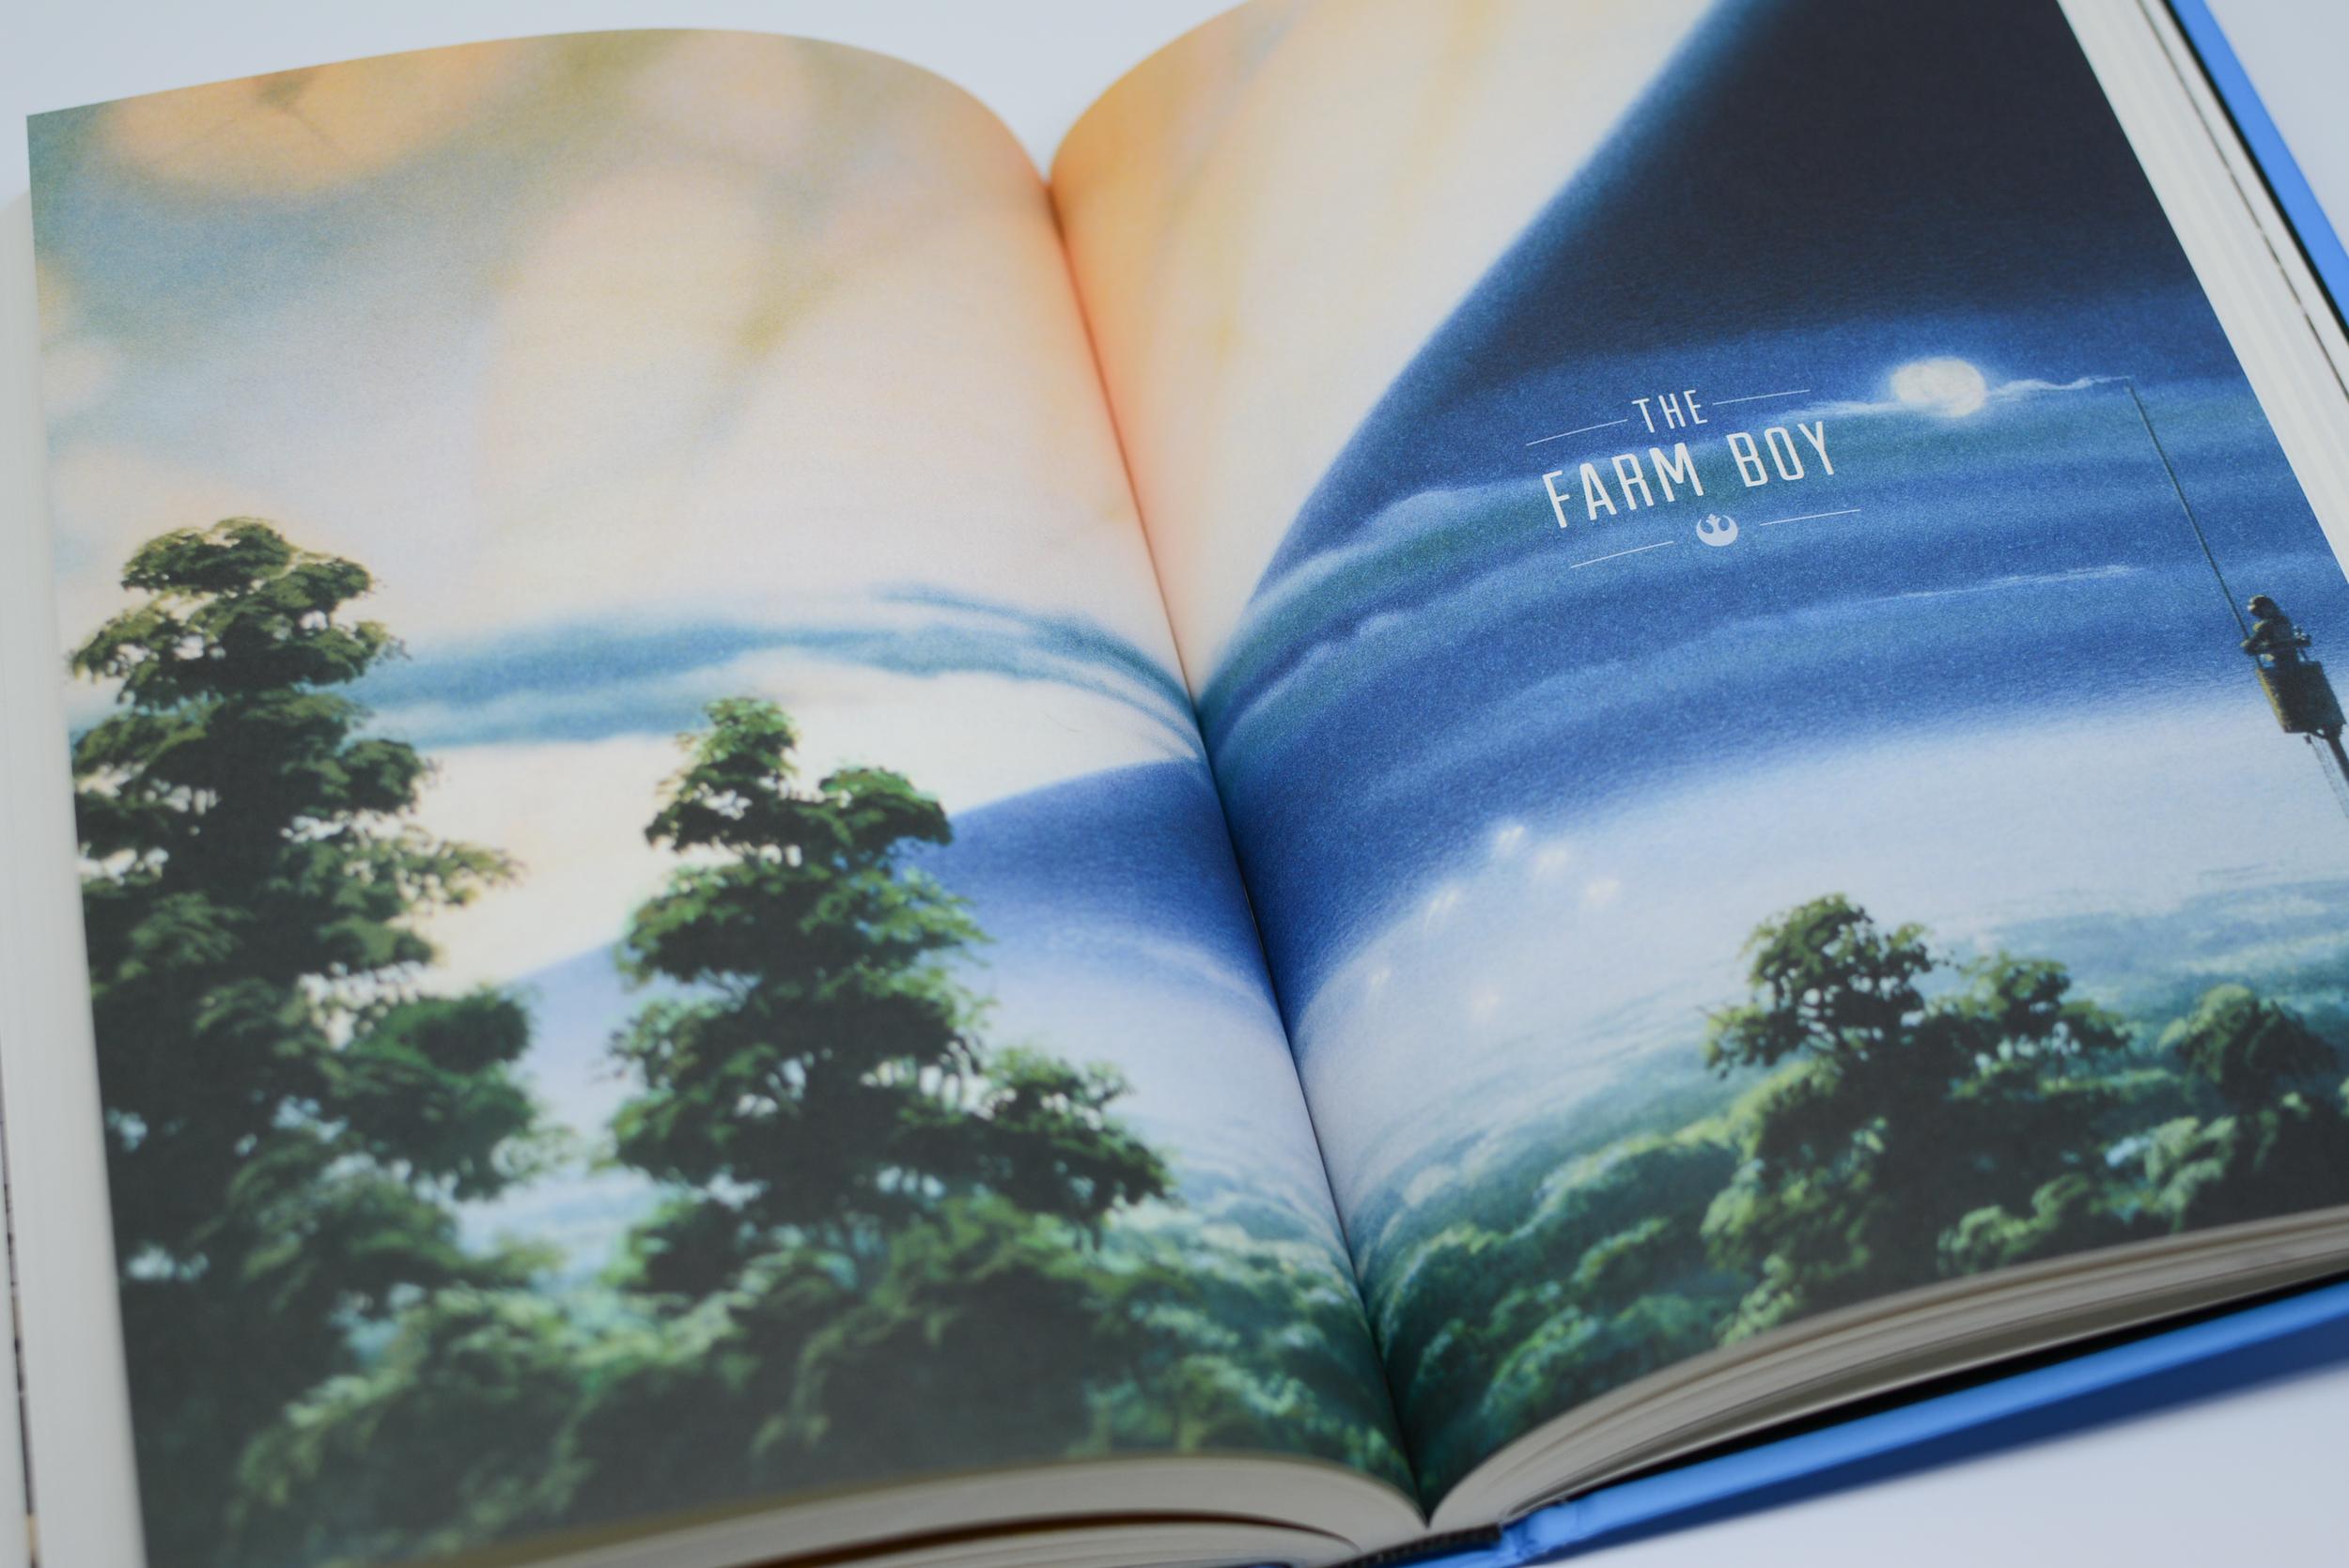 Pam Portfolio Starwars Books-54.jpg